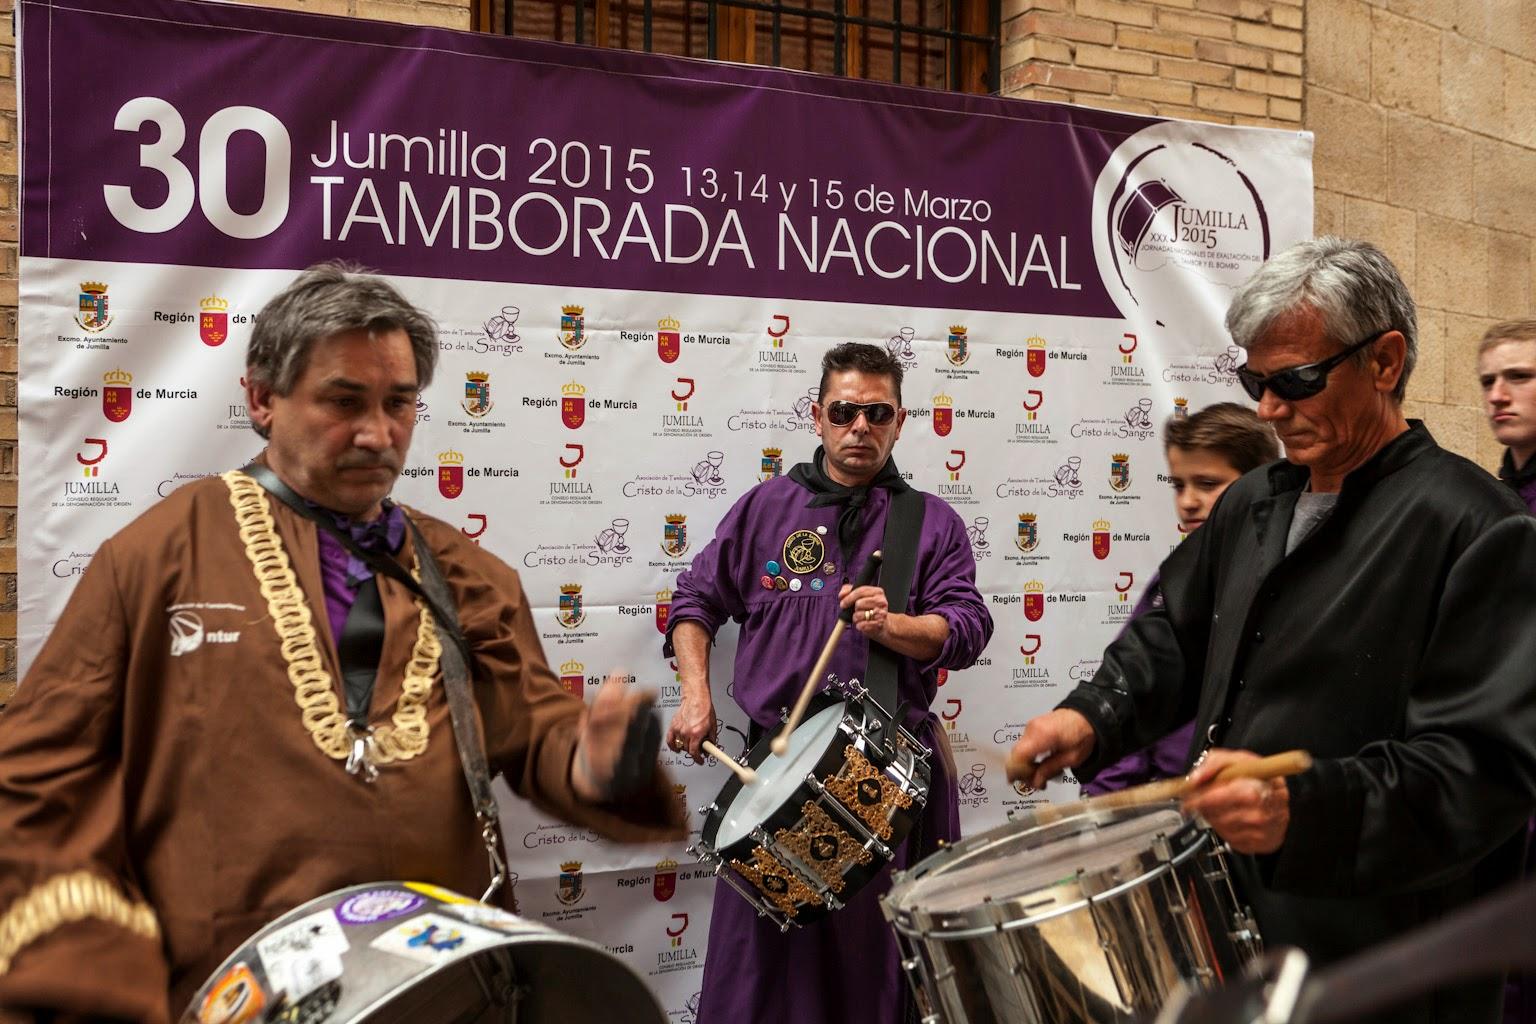 Tamborada Nacional, Calanda, Jumilla